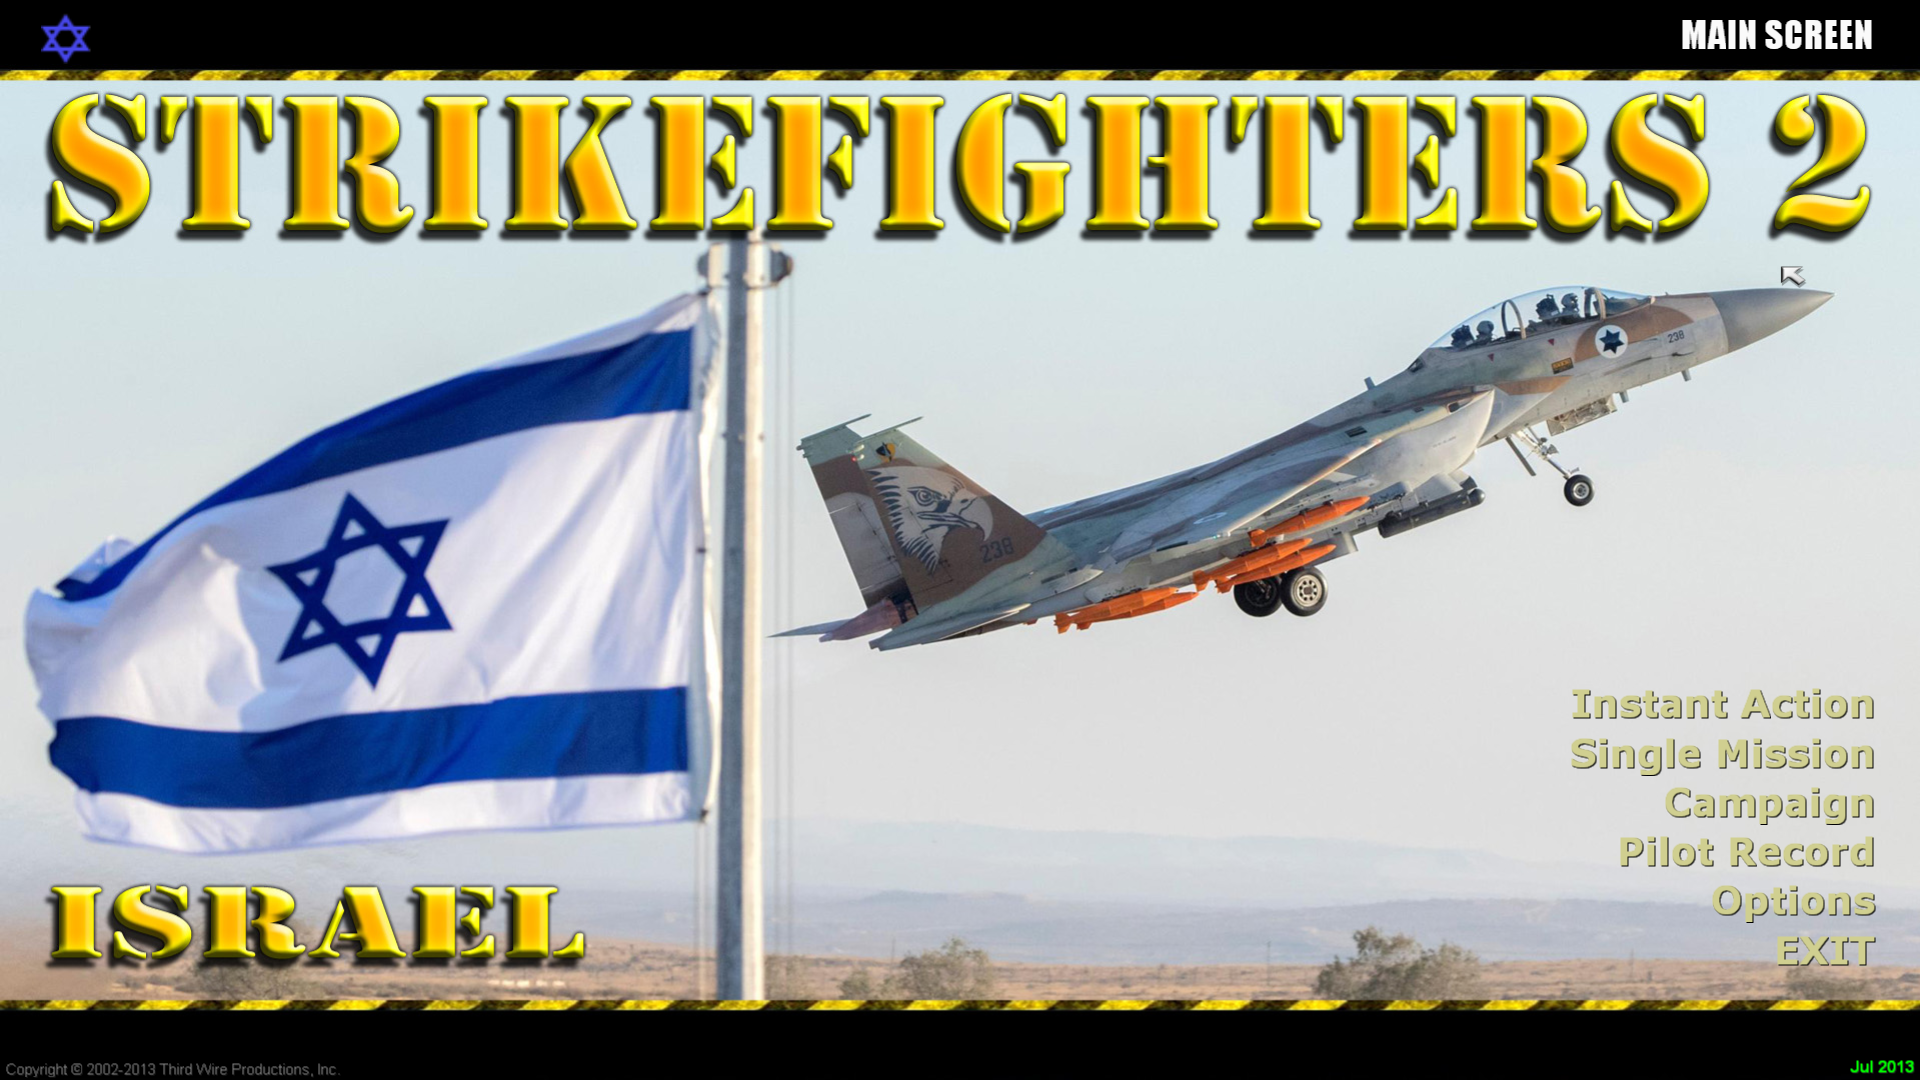 Strikefighters2 Israel Hi-Res 1920x1080 Menu Screens and Music!